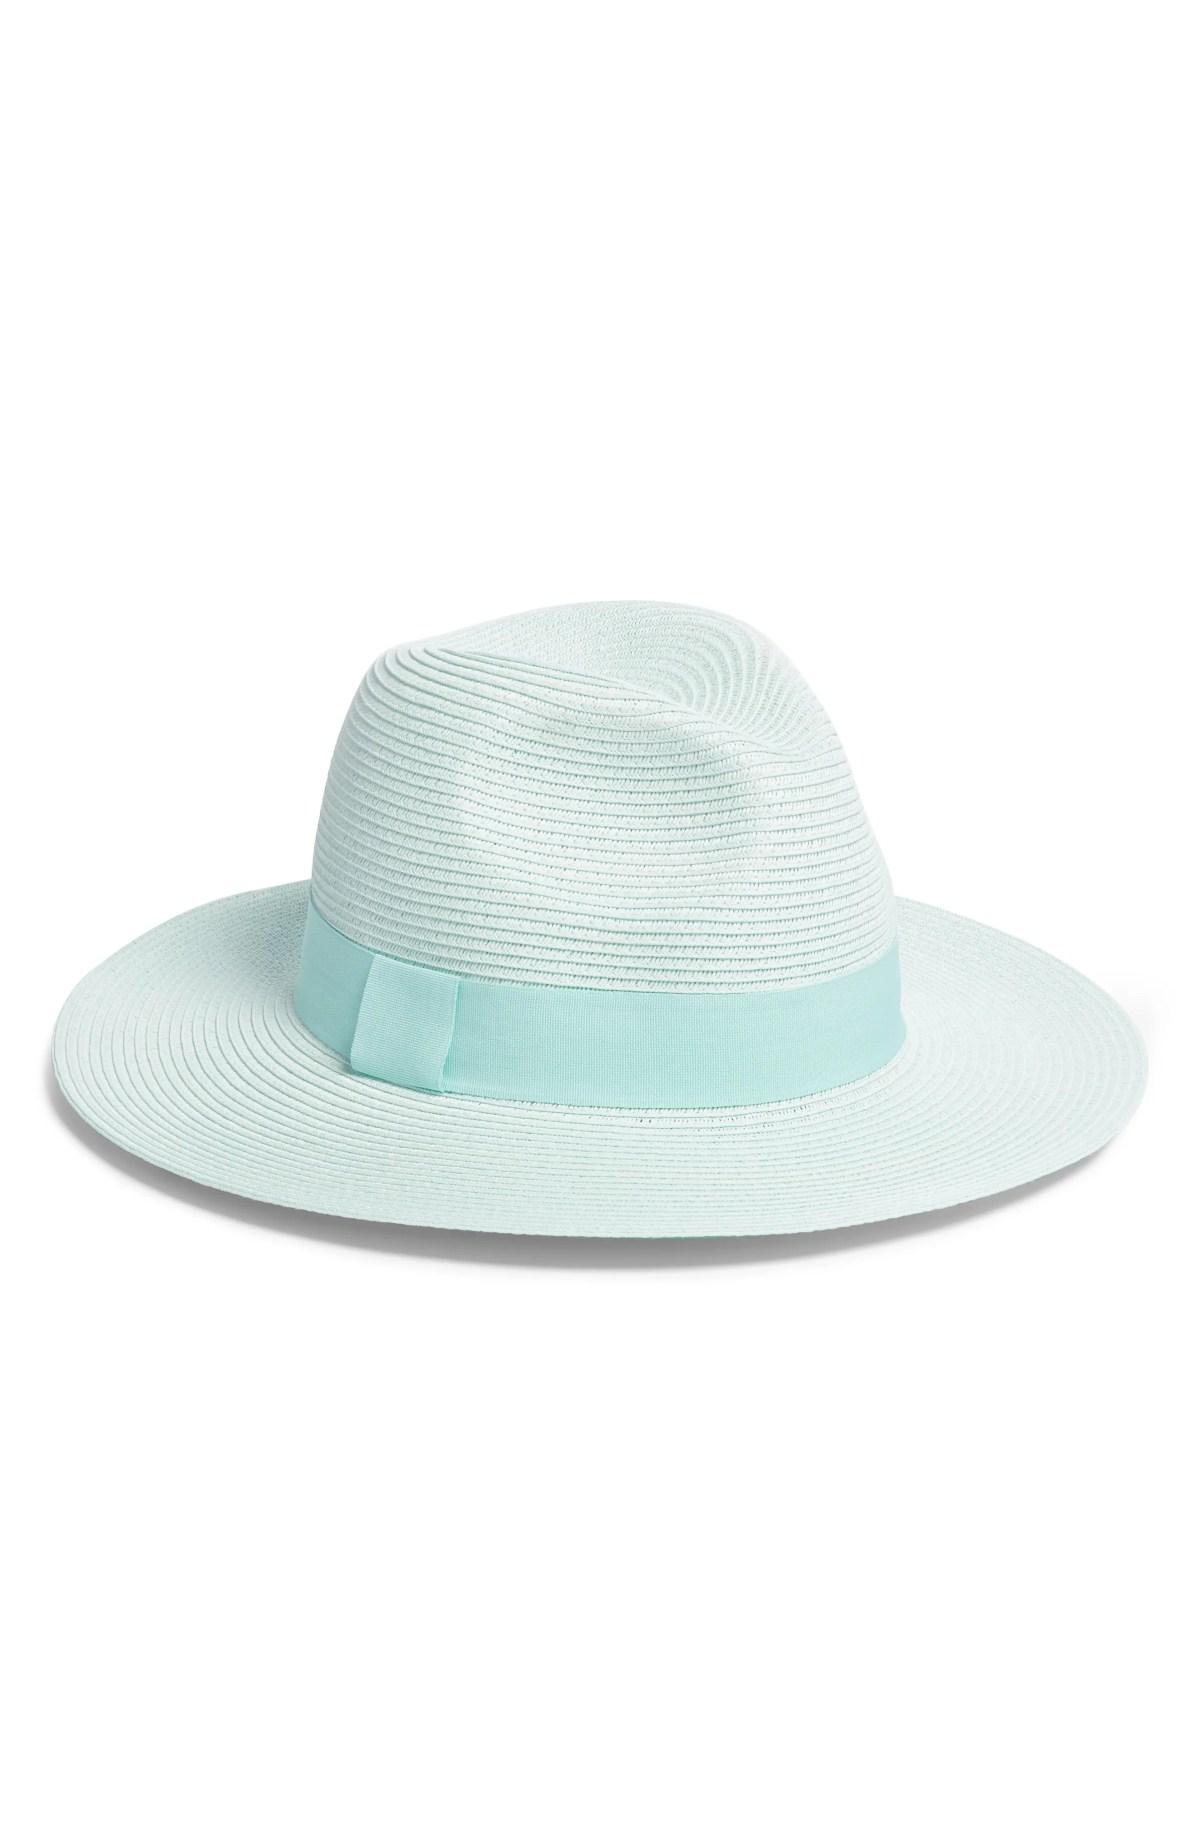 Woven Panama Hat, Main, color, GREEN AQUA